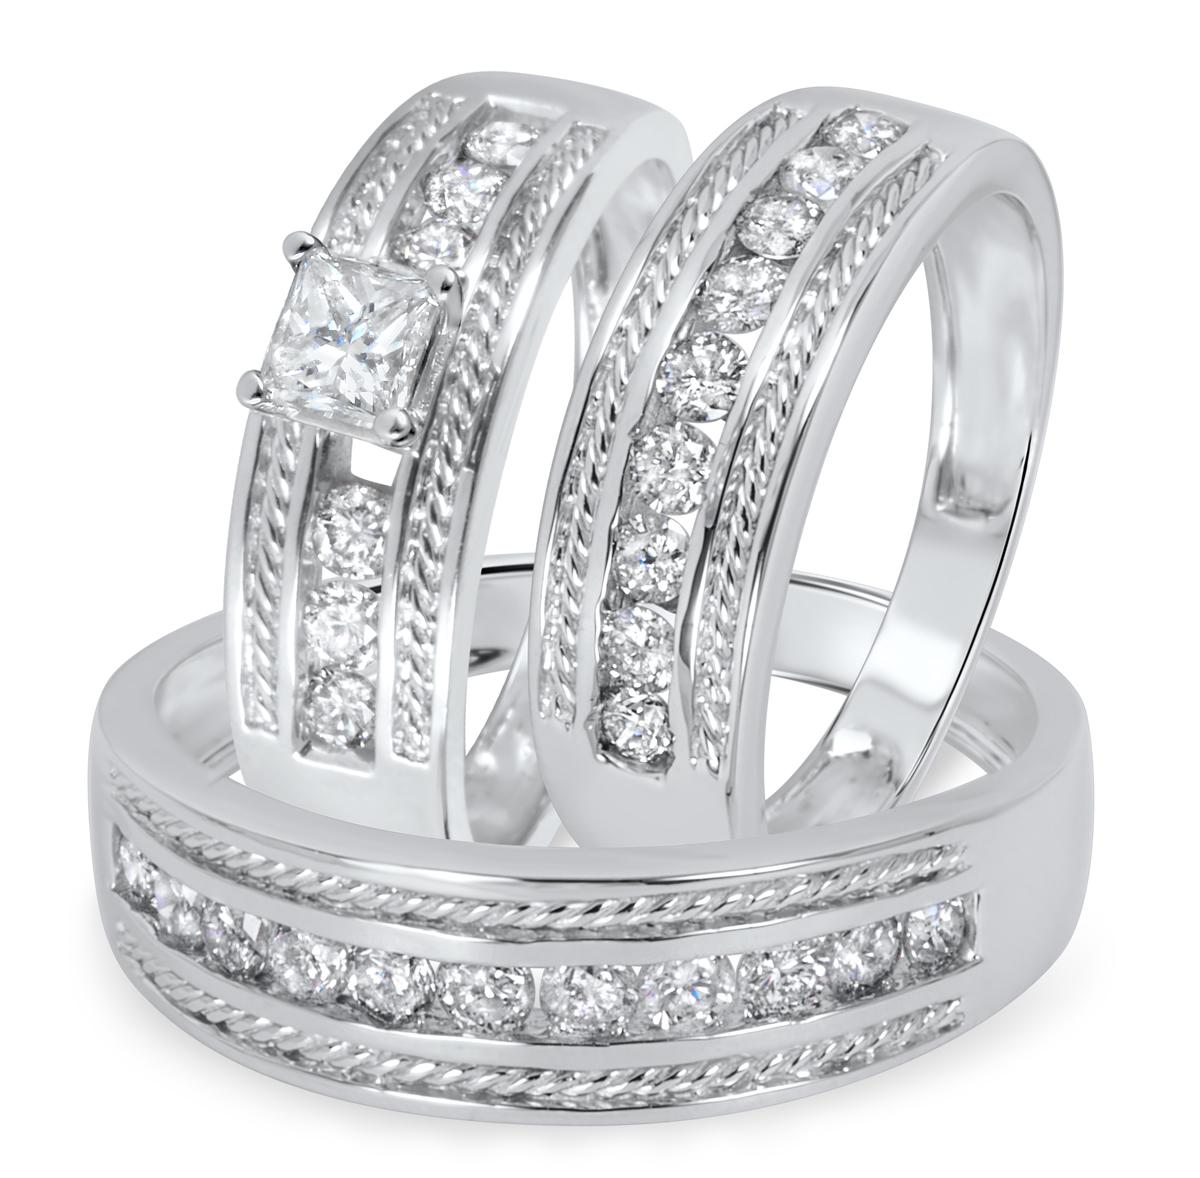 1 1/3 CT. T.W. Diamond Ladies Engagement Ring, Wedding Band, Men's Wedding Band